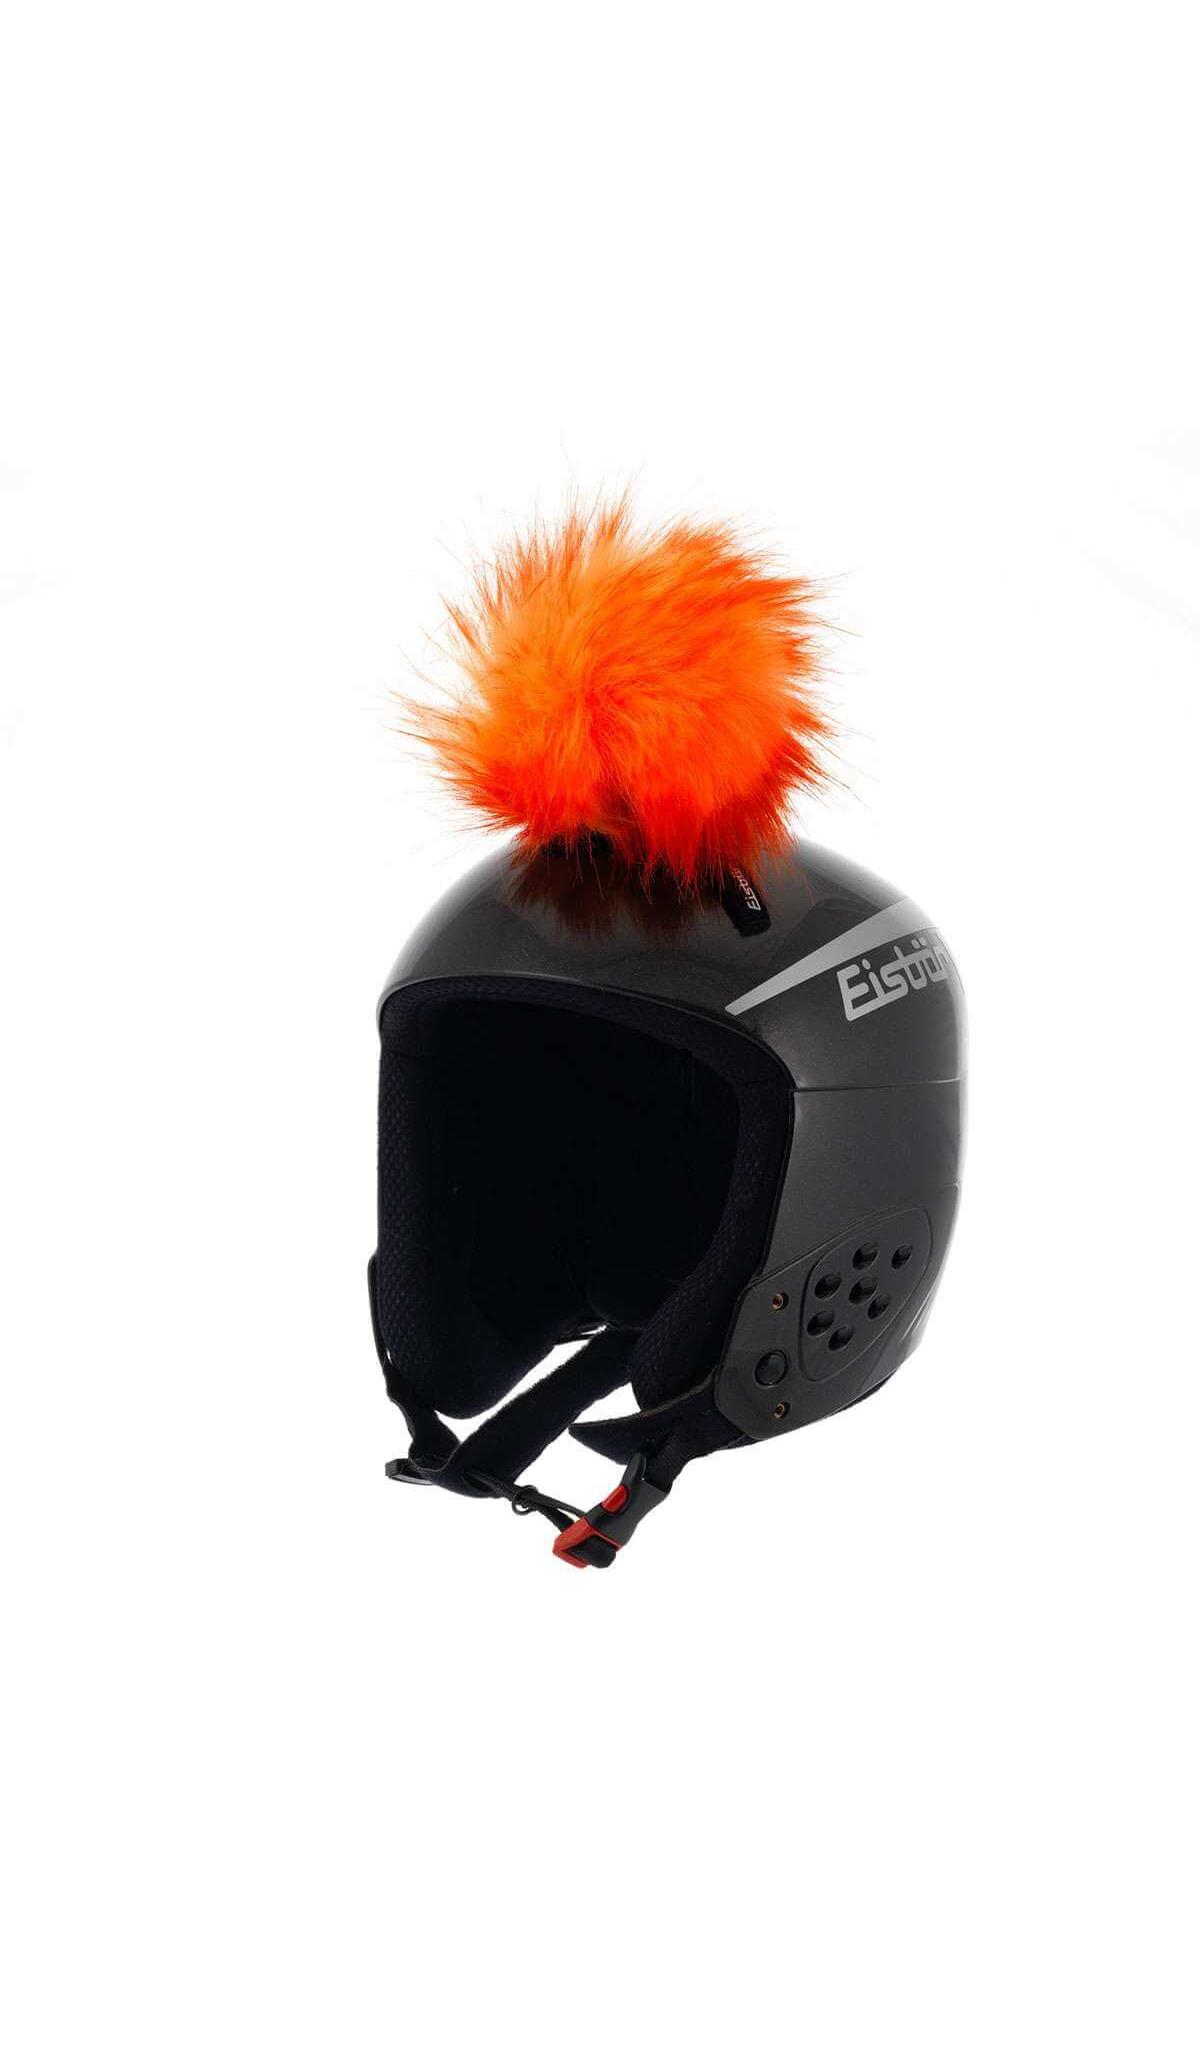 Аксессуар для шлема Lux Sticker Eisbär — фото 1